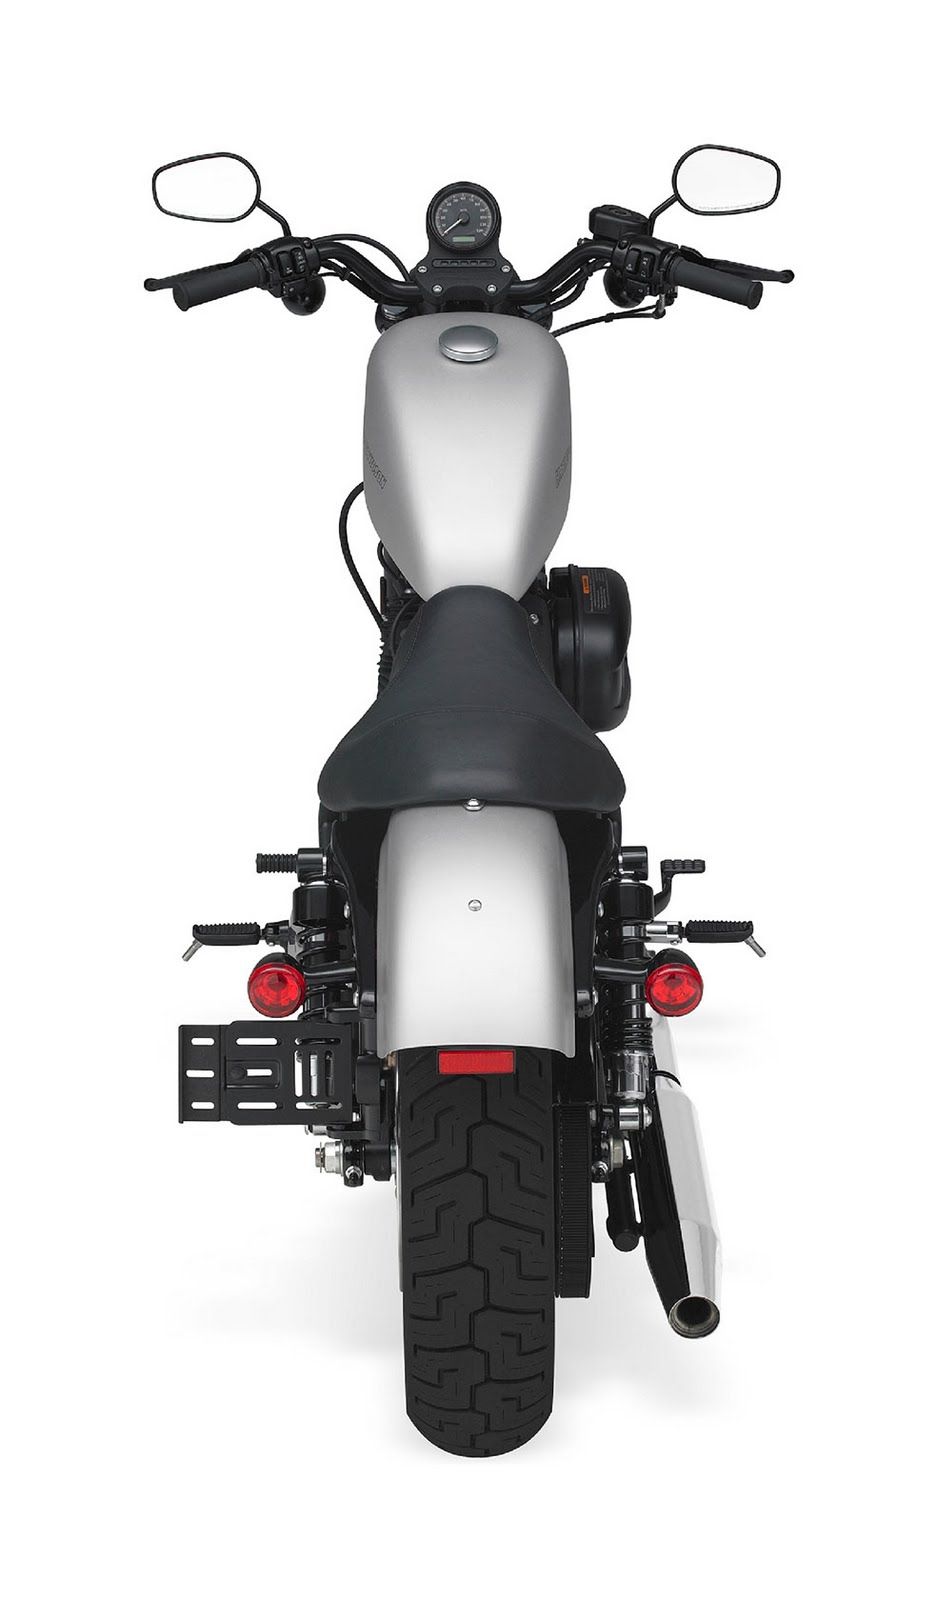 2010 Harley-Davidson Sportster Iron 883